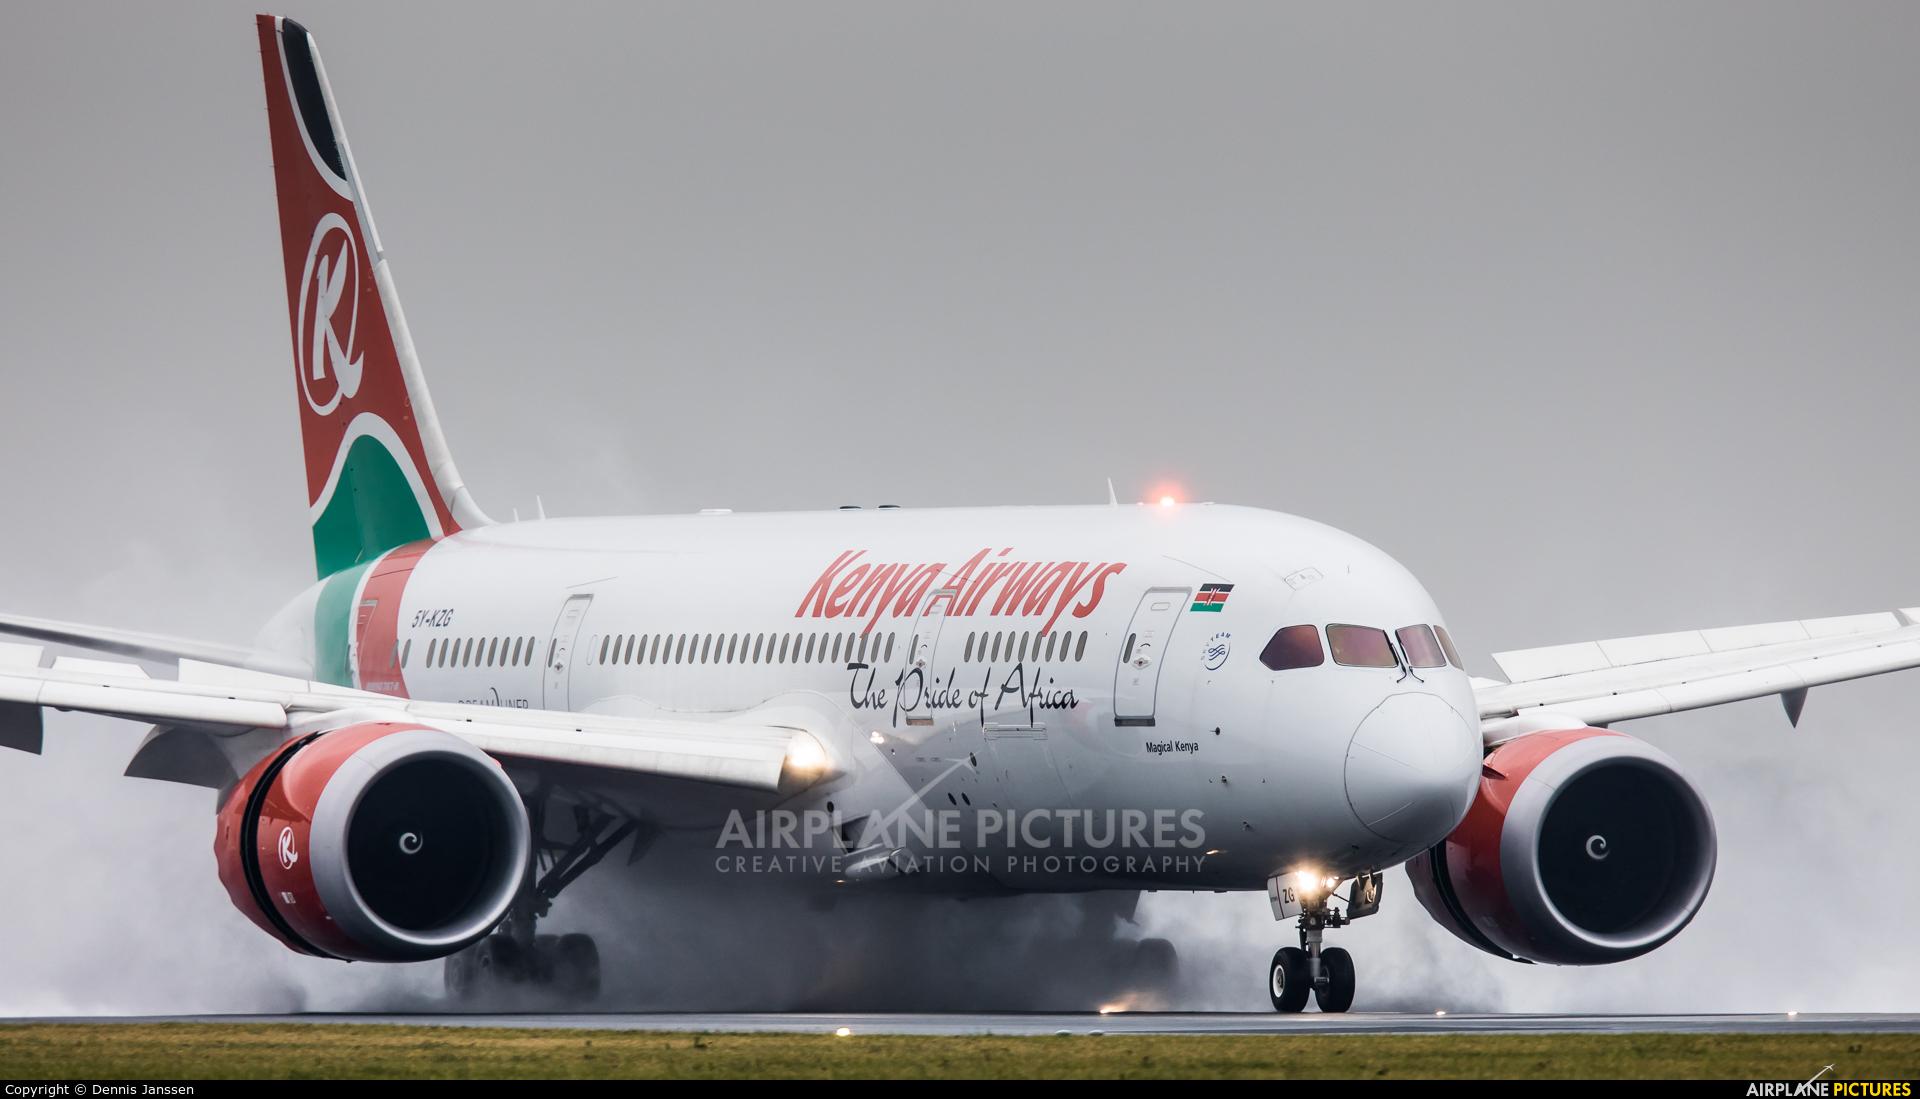 Kenya Airways 5Y-KZG aircraft at Amsterdam - Schiphol